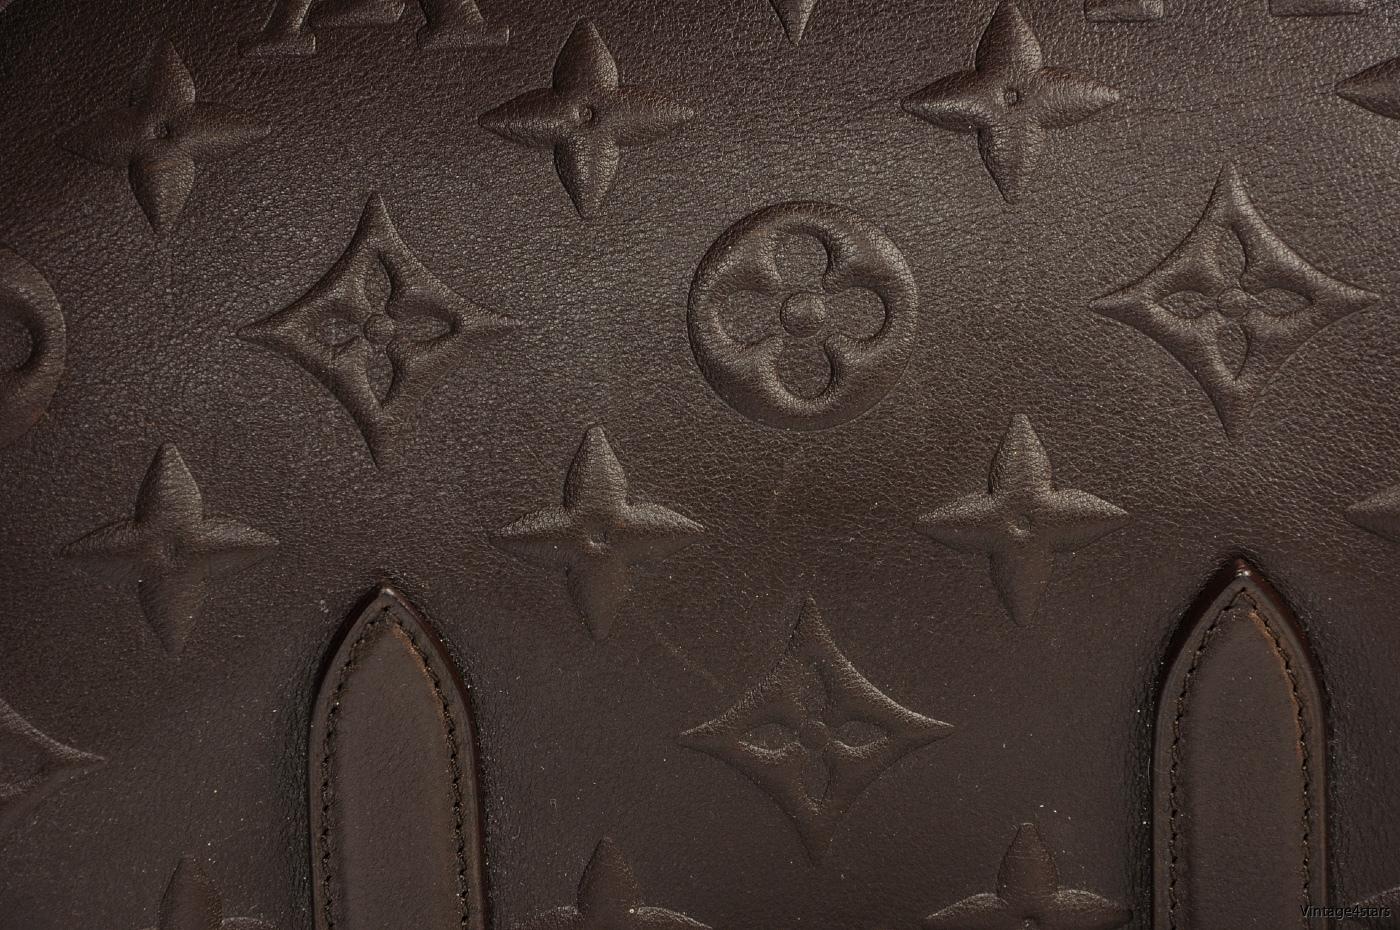 Louis Vuitton Keepall Edun 4-2